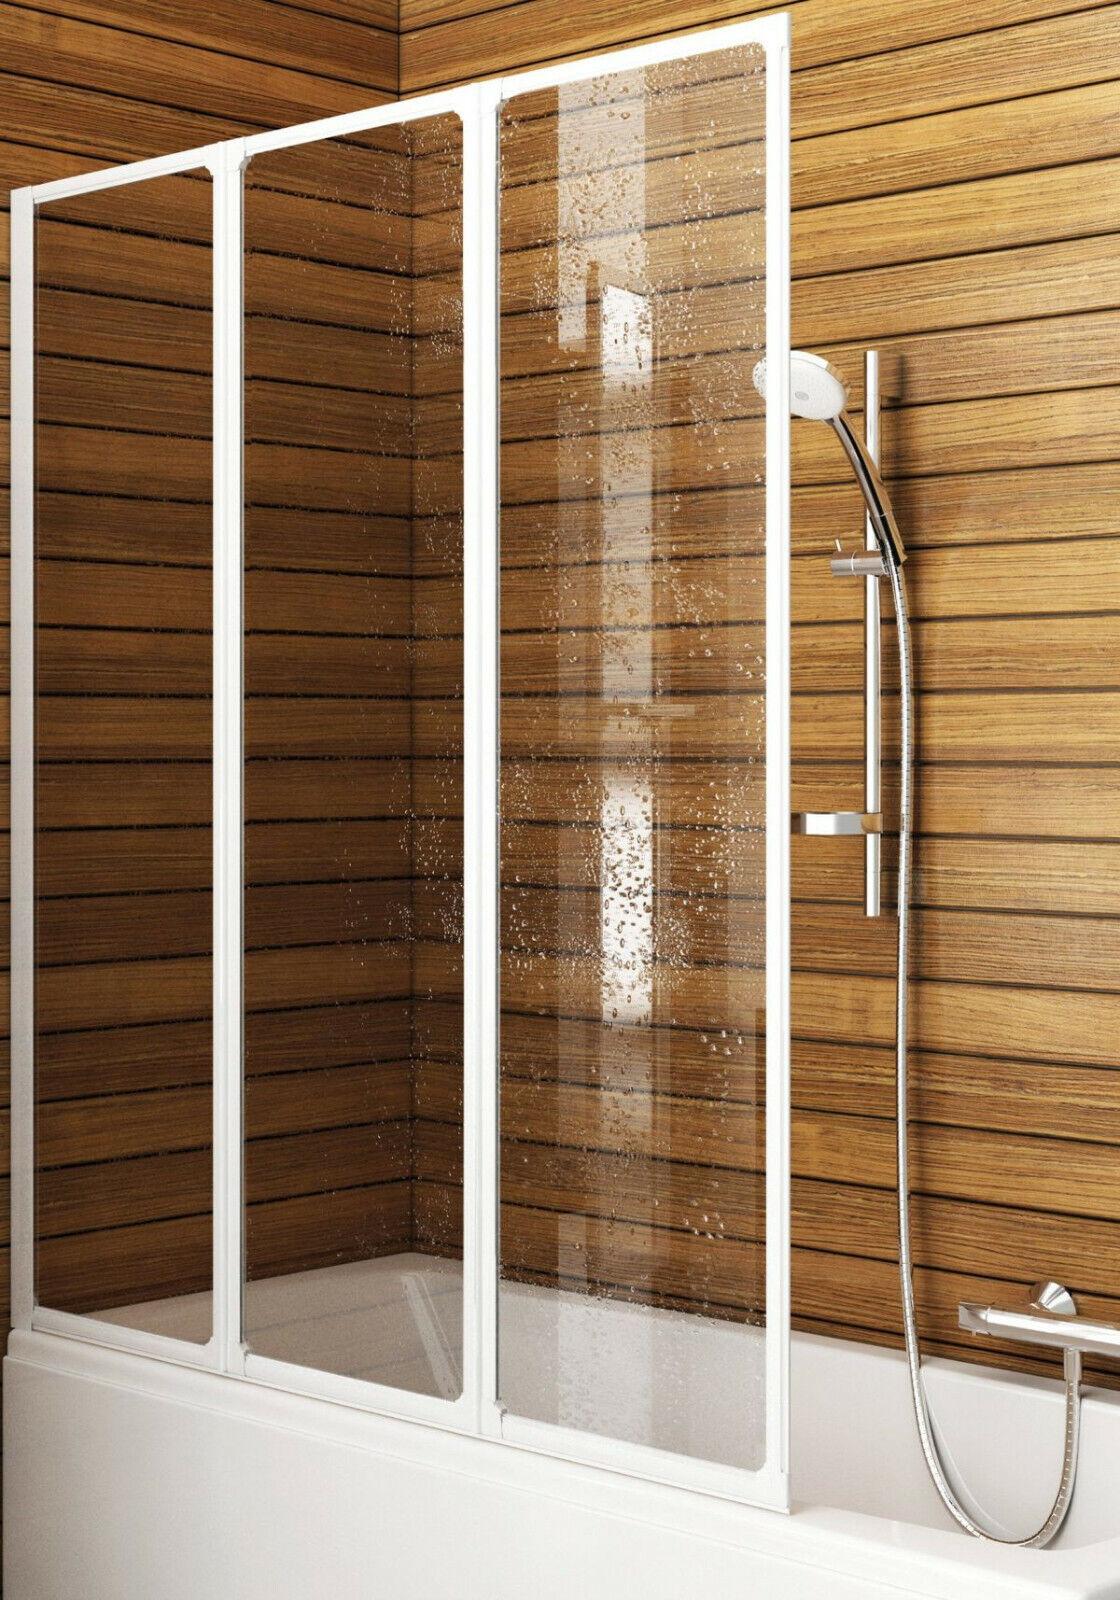 Badewannenfaltwand 120x140cm Duschtrennwand Faltwand Duschabtrennung Duschwand